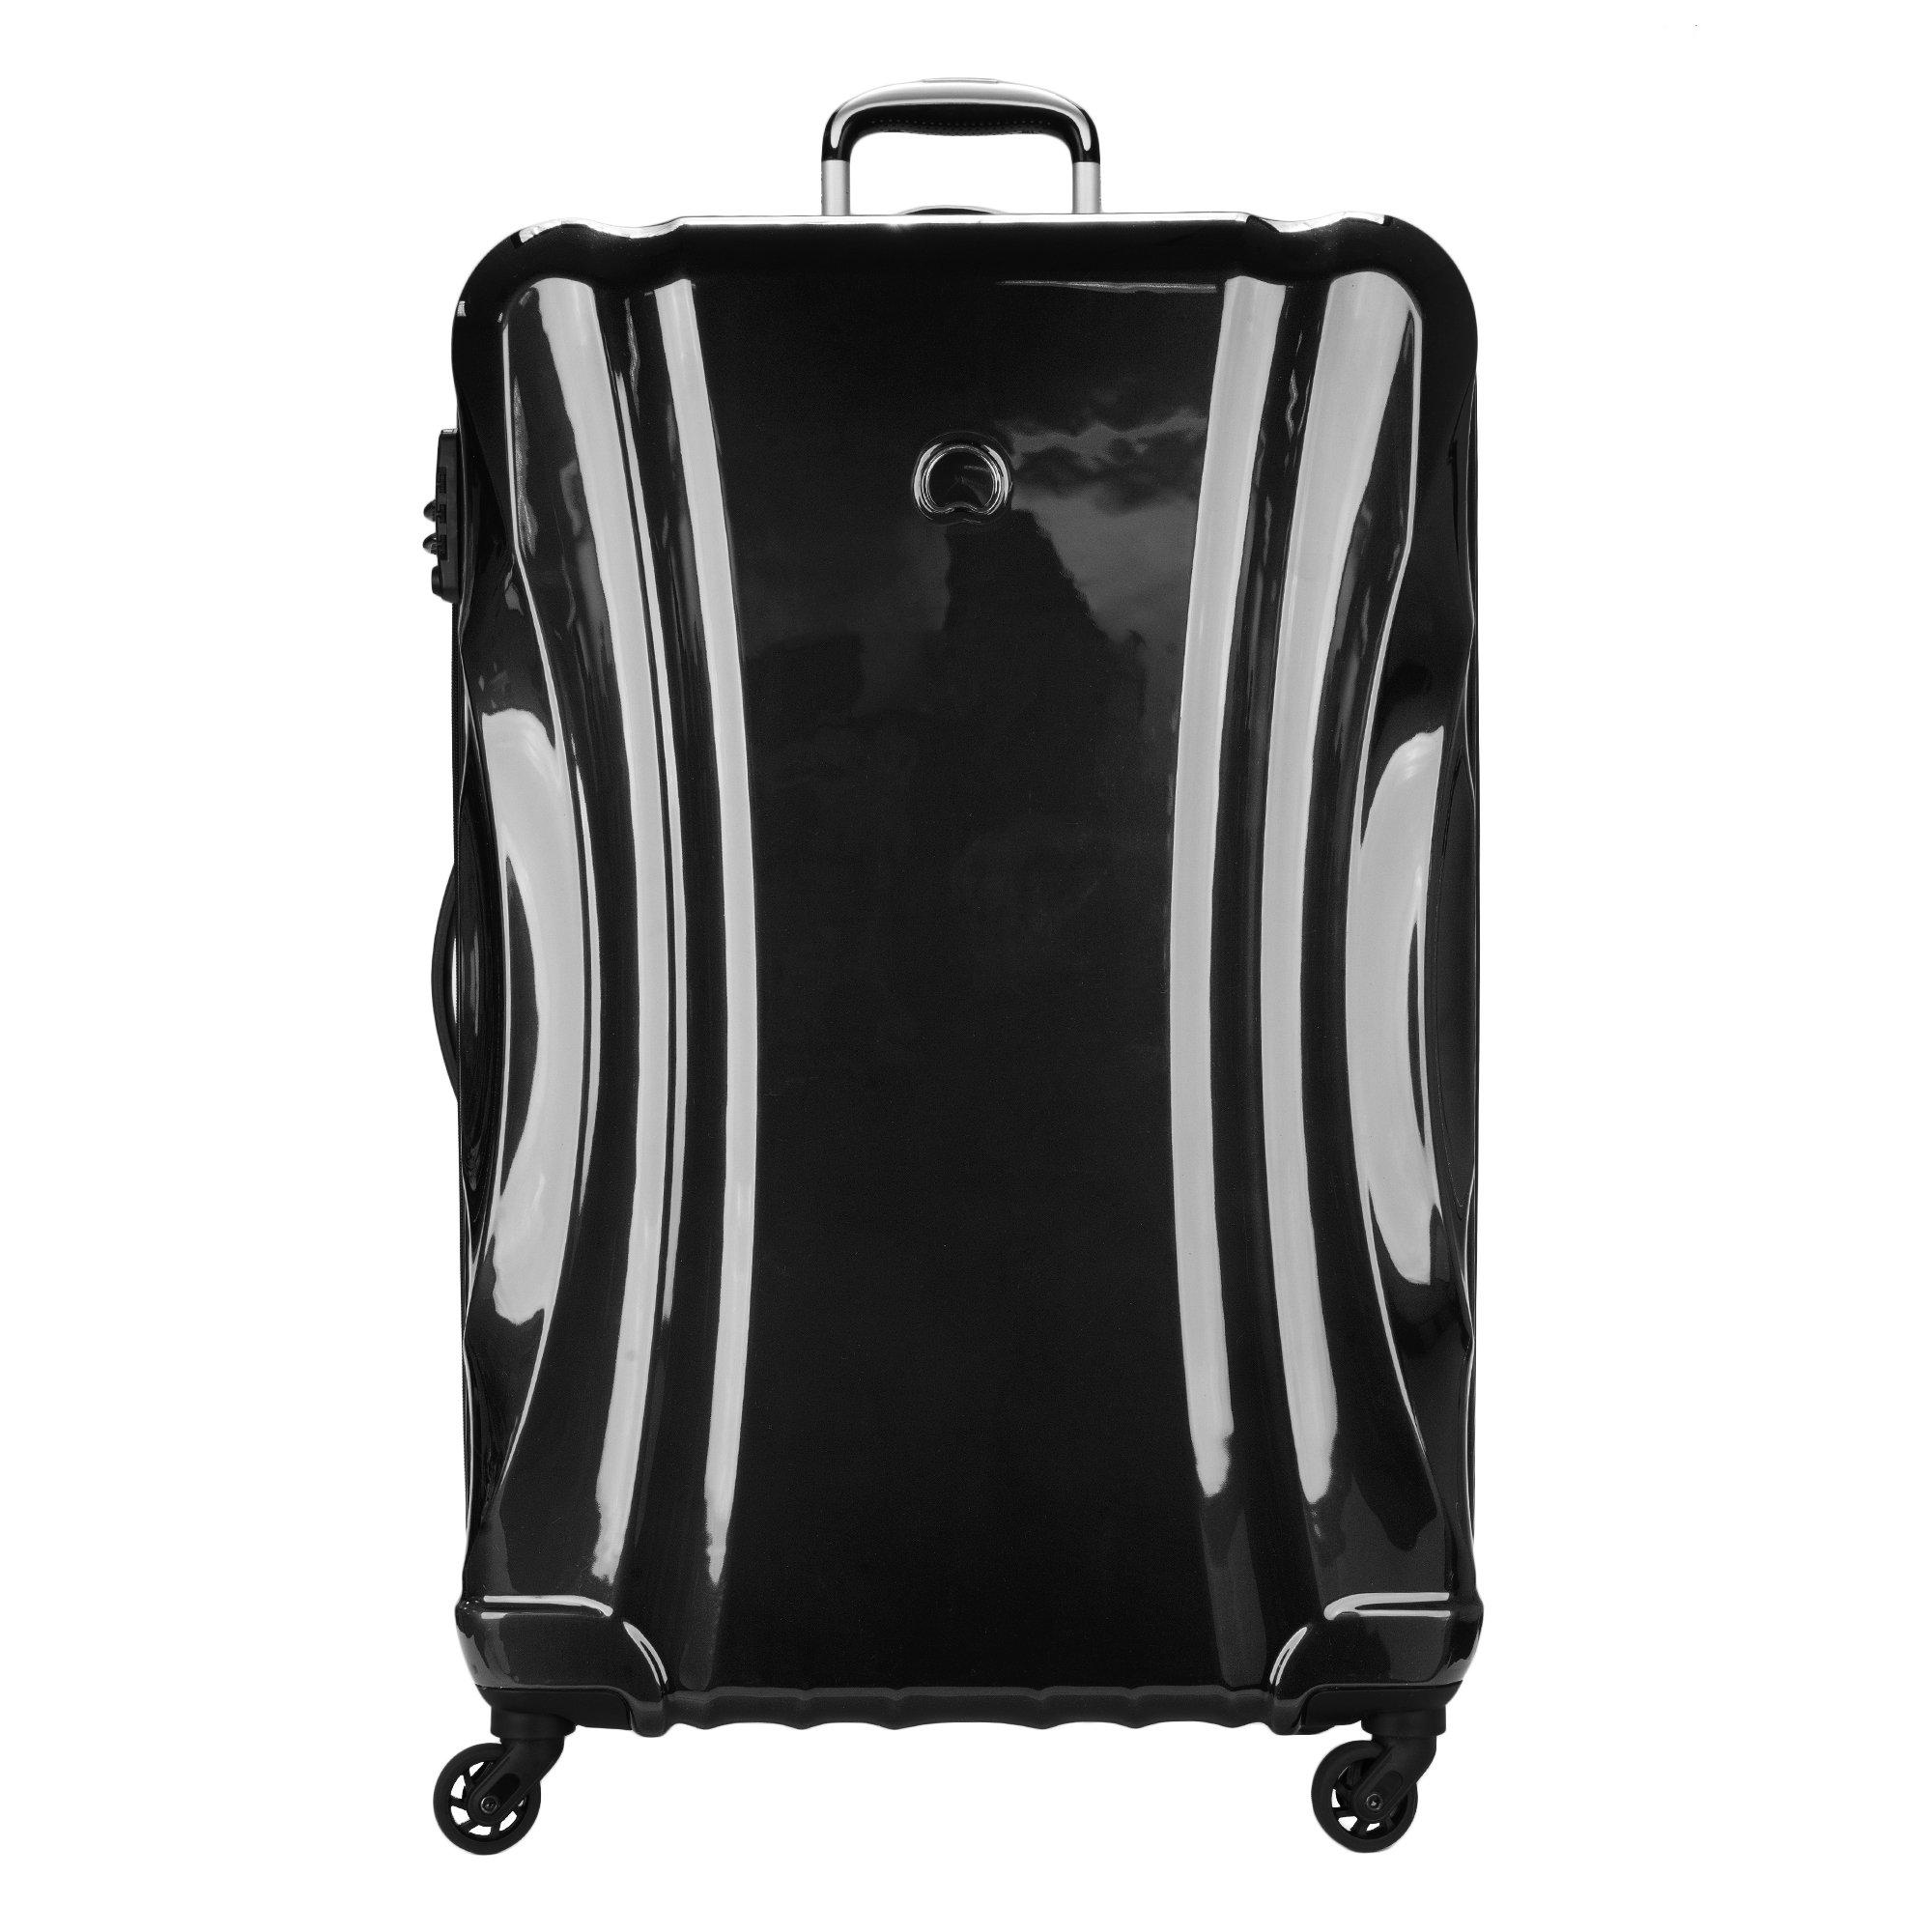 Delsey Luggage Passenger Lite 29 inch Expandable Suitcase, Black